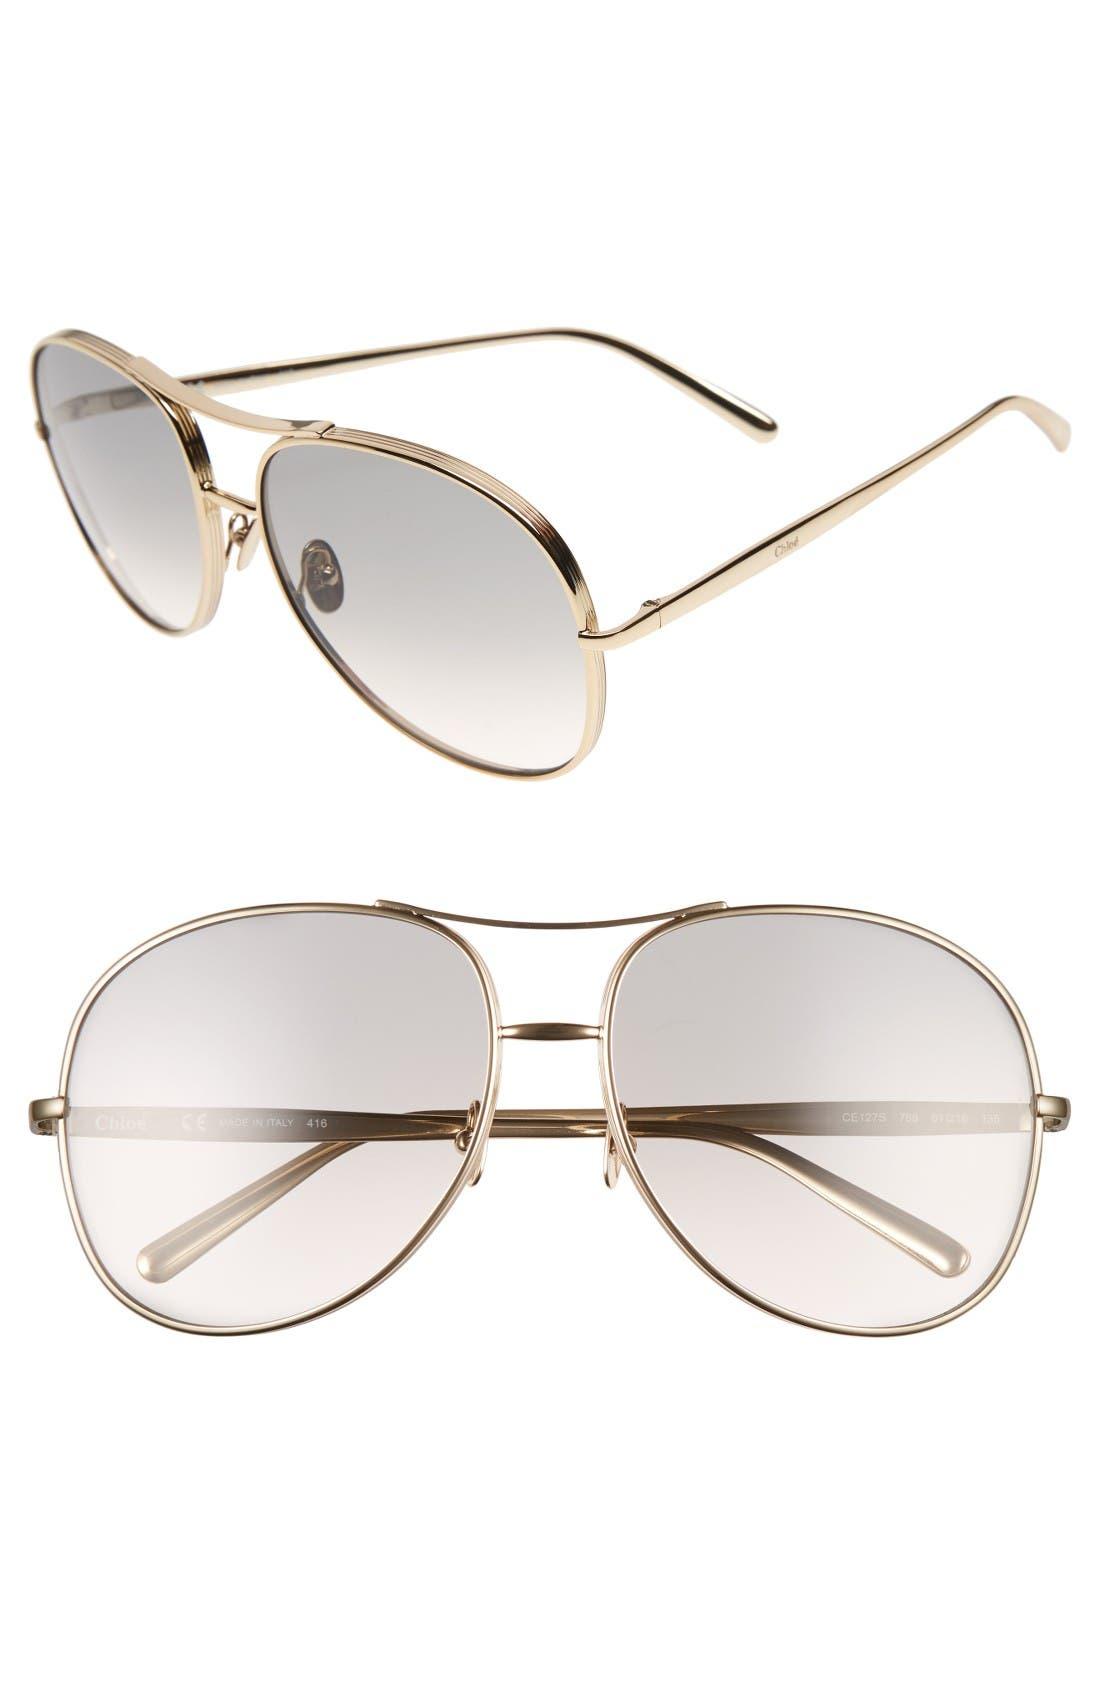 Main Image - Chloé 61mm Oversize Sunglasses